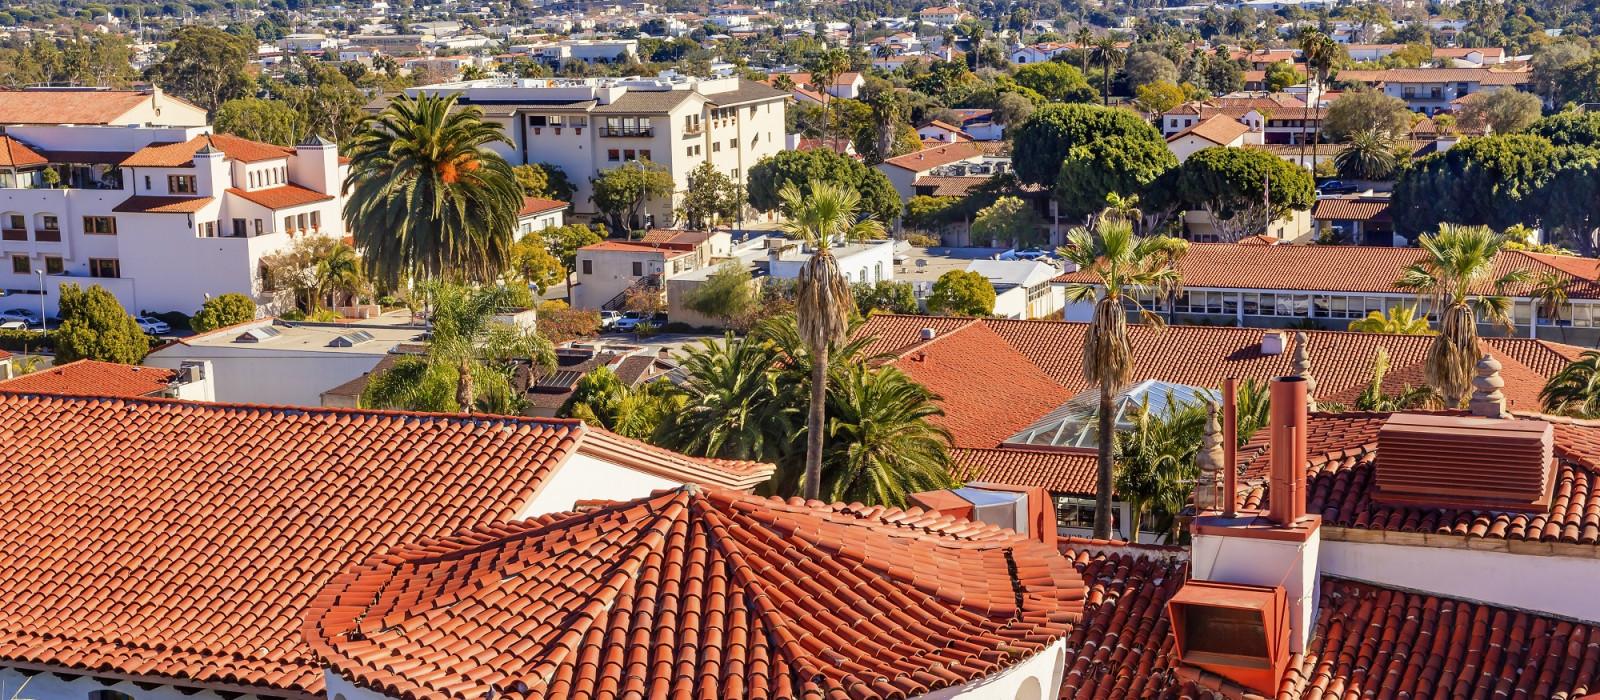 Destination Santa Barbara USA